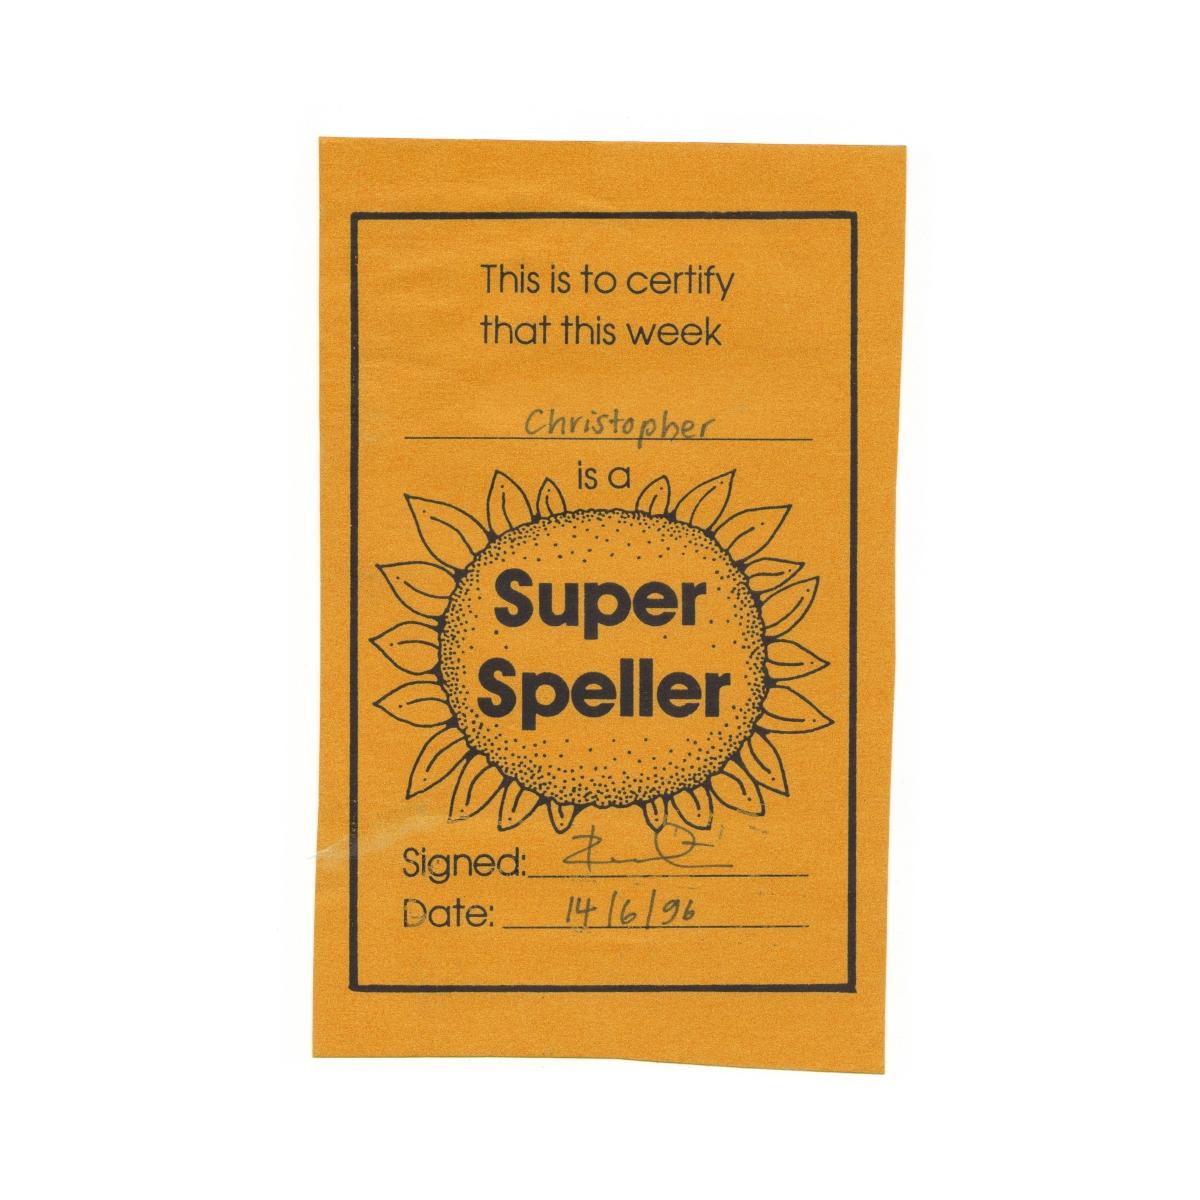 Super speller certificate.